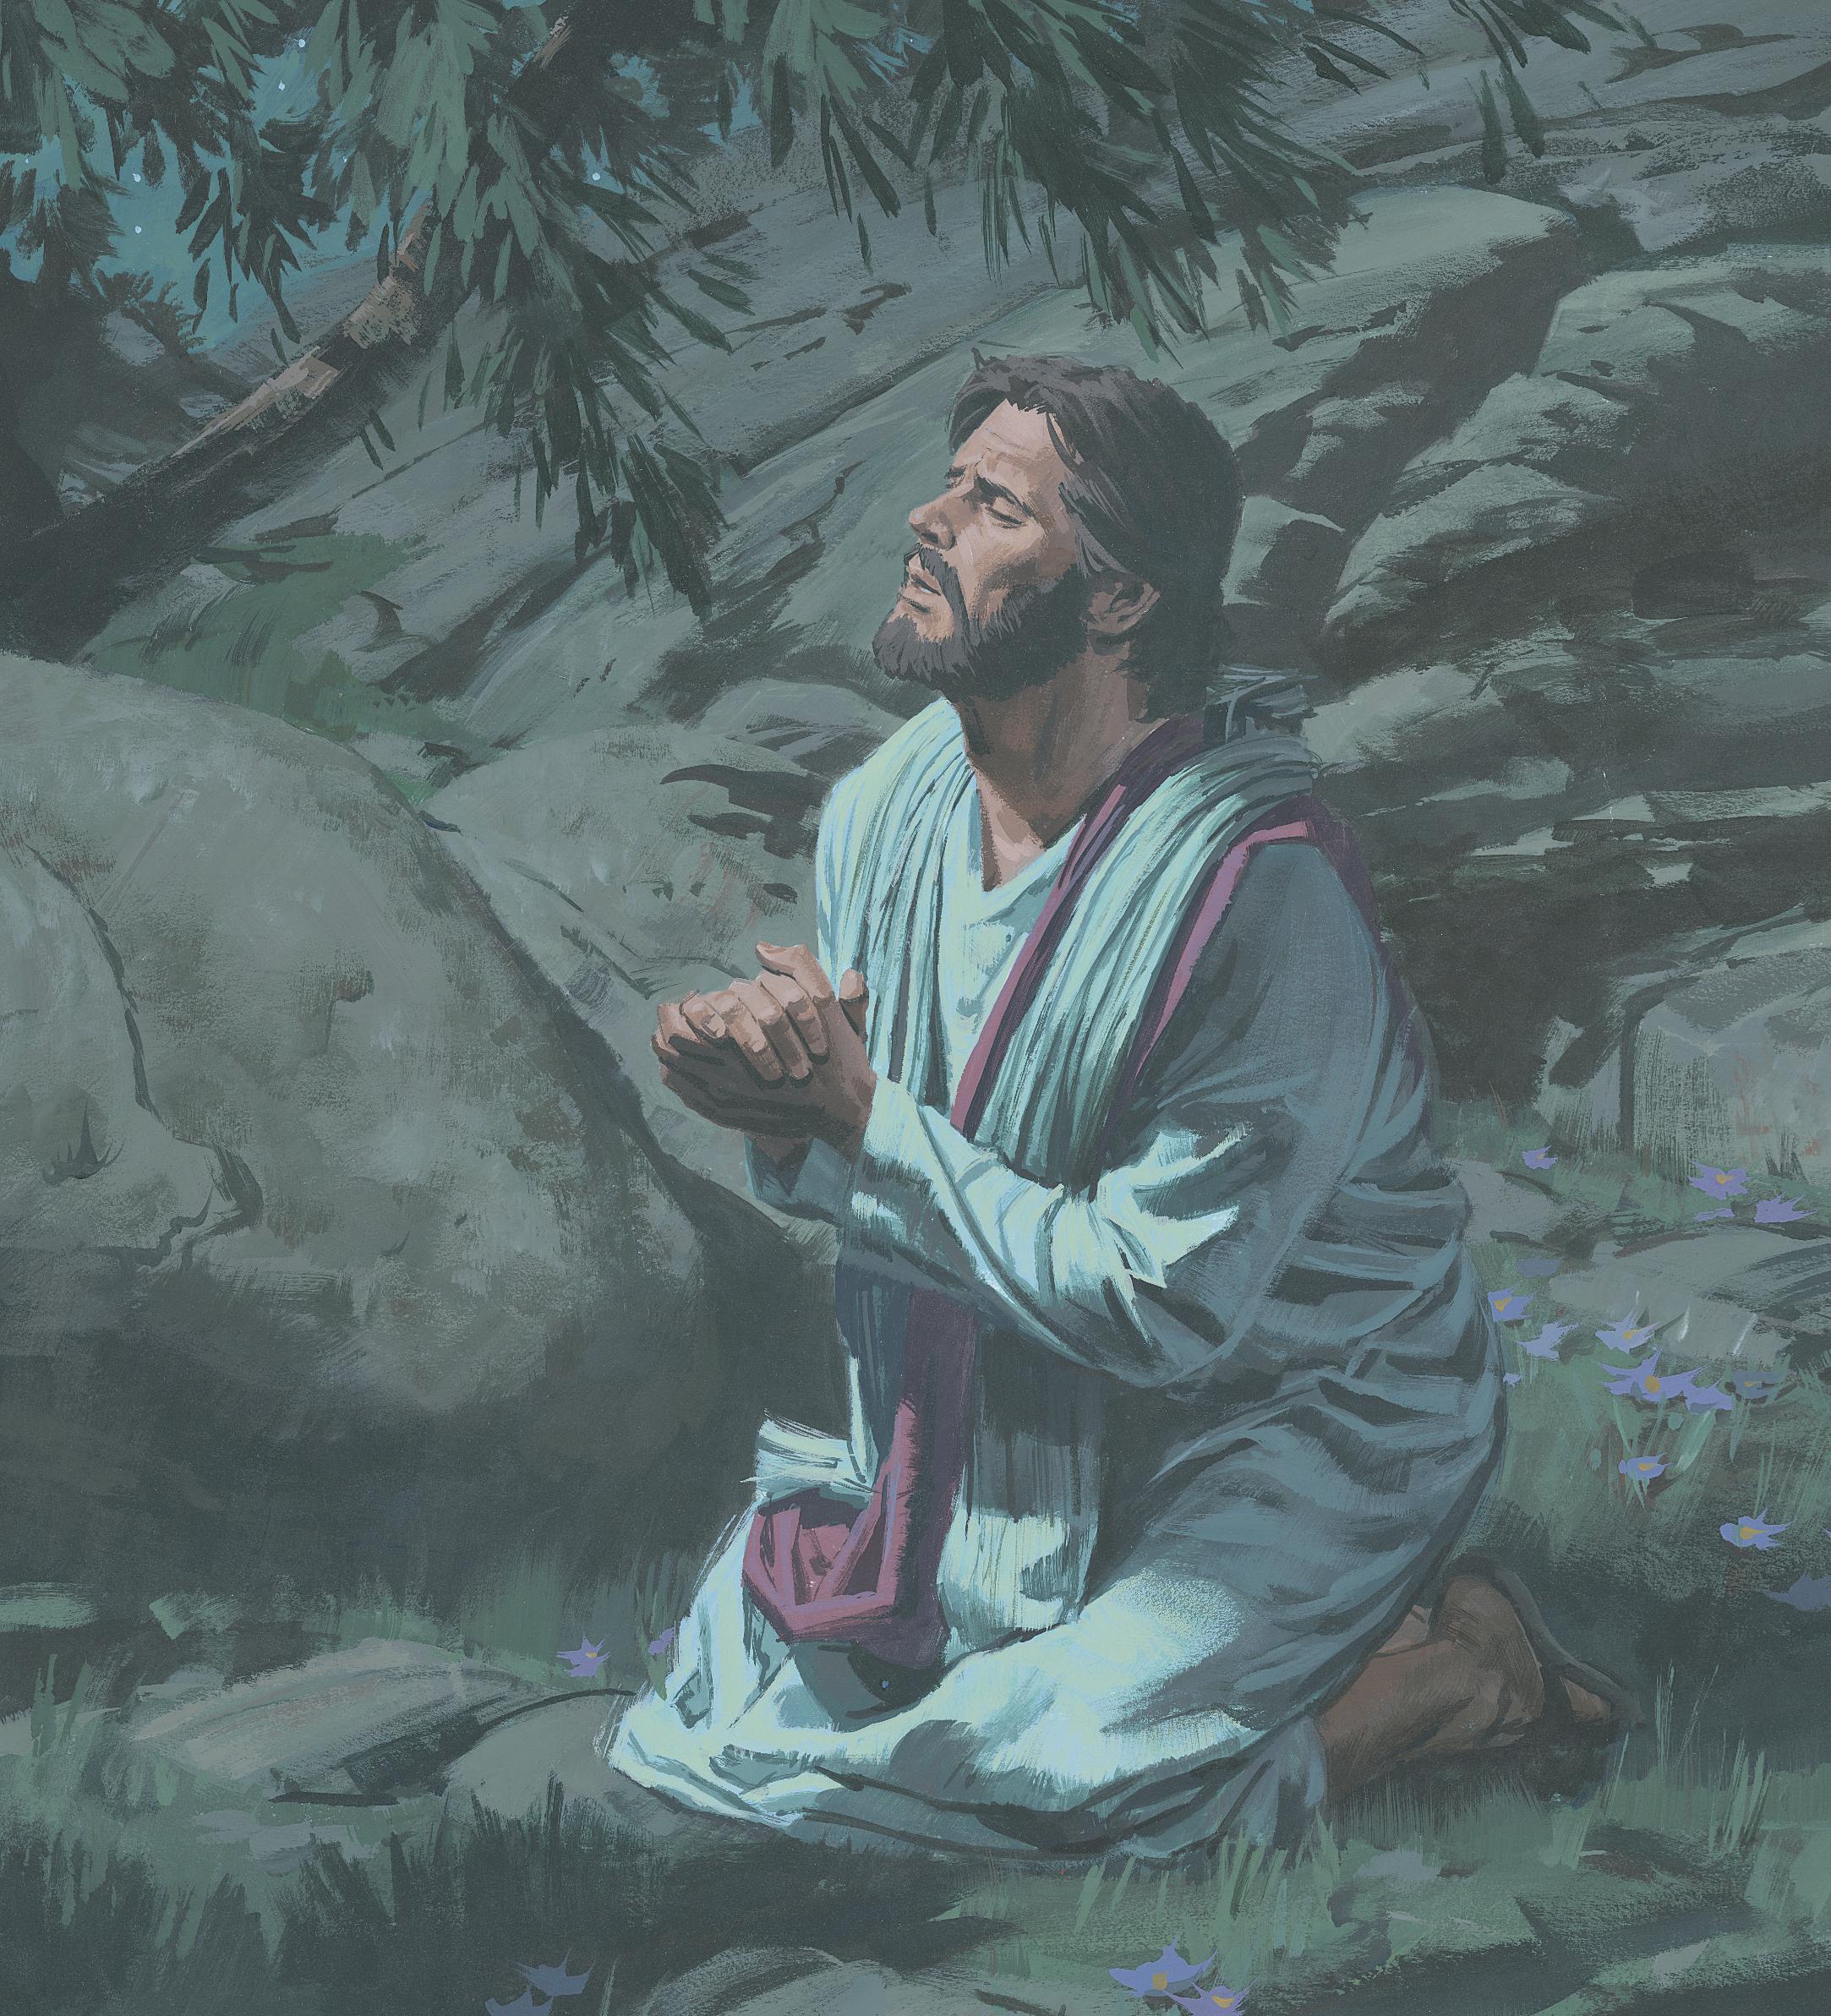 Jesus Suffers in the Garden of Gethsemane, by Paul Mann